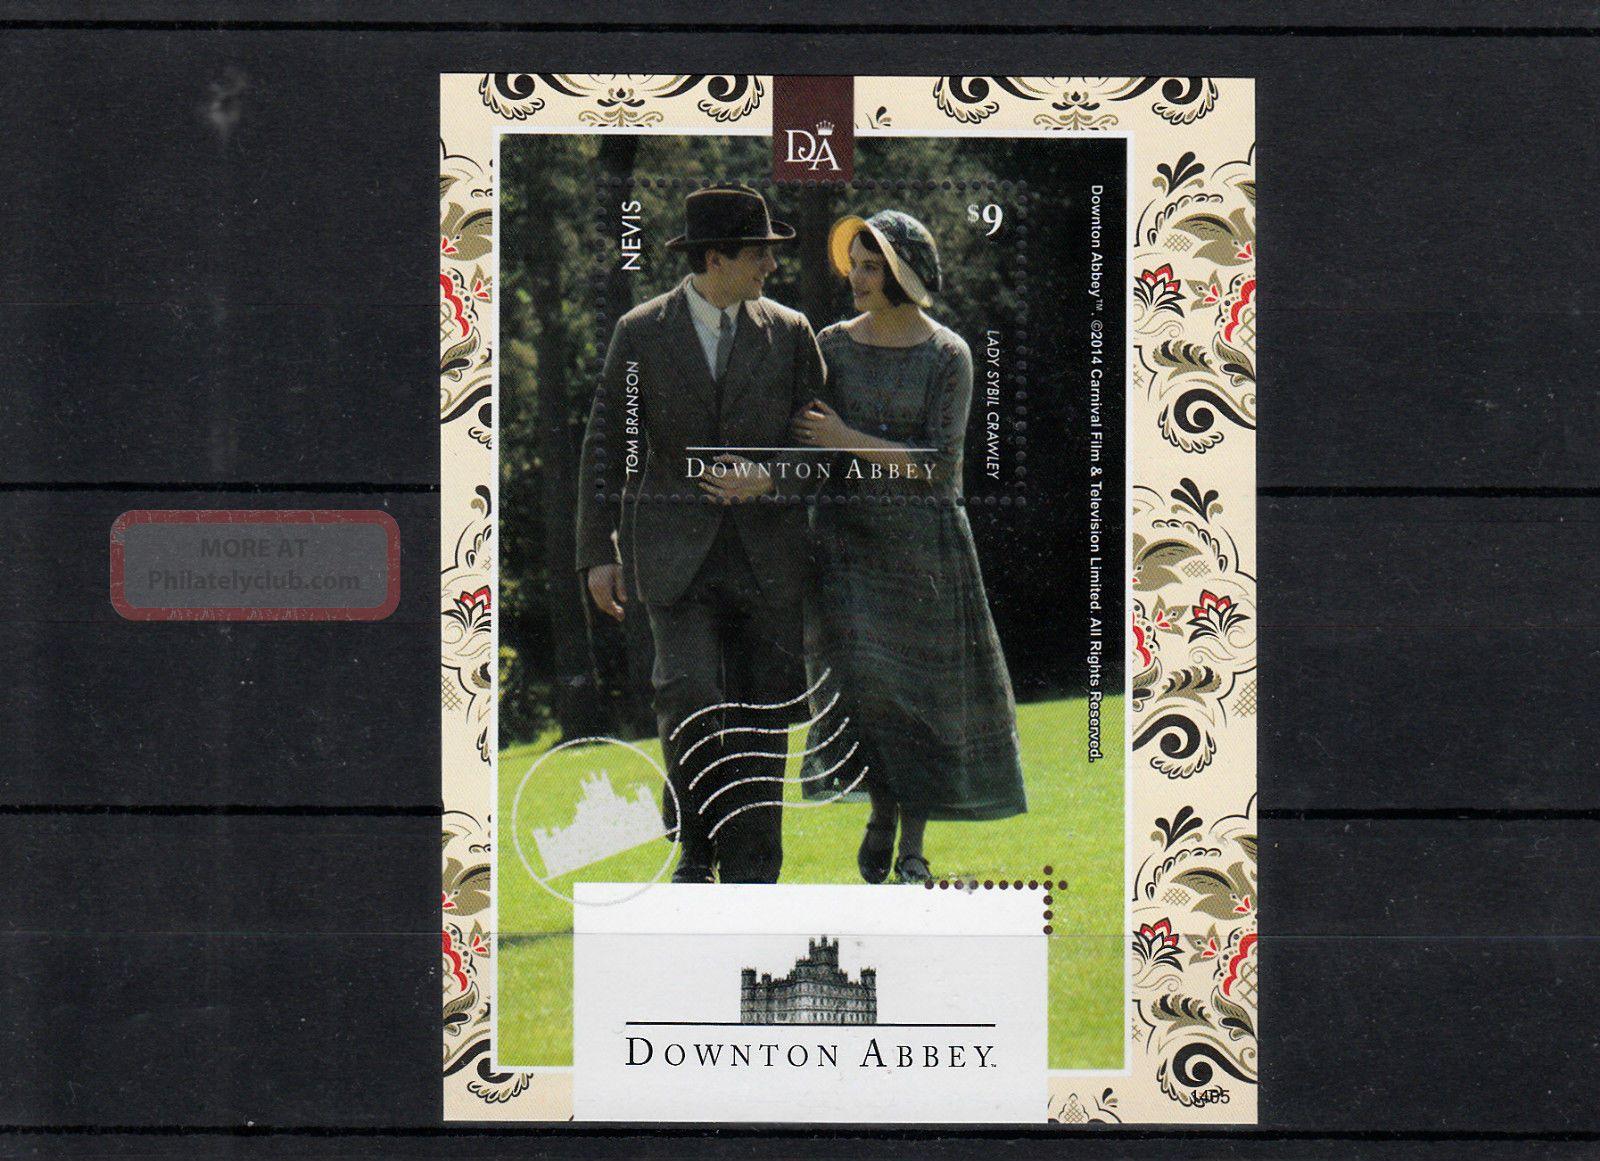 Nevis 2014 Downton Abbey 1v S/s Lady Sybil Crawley Tom Branson Caribbean photo